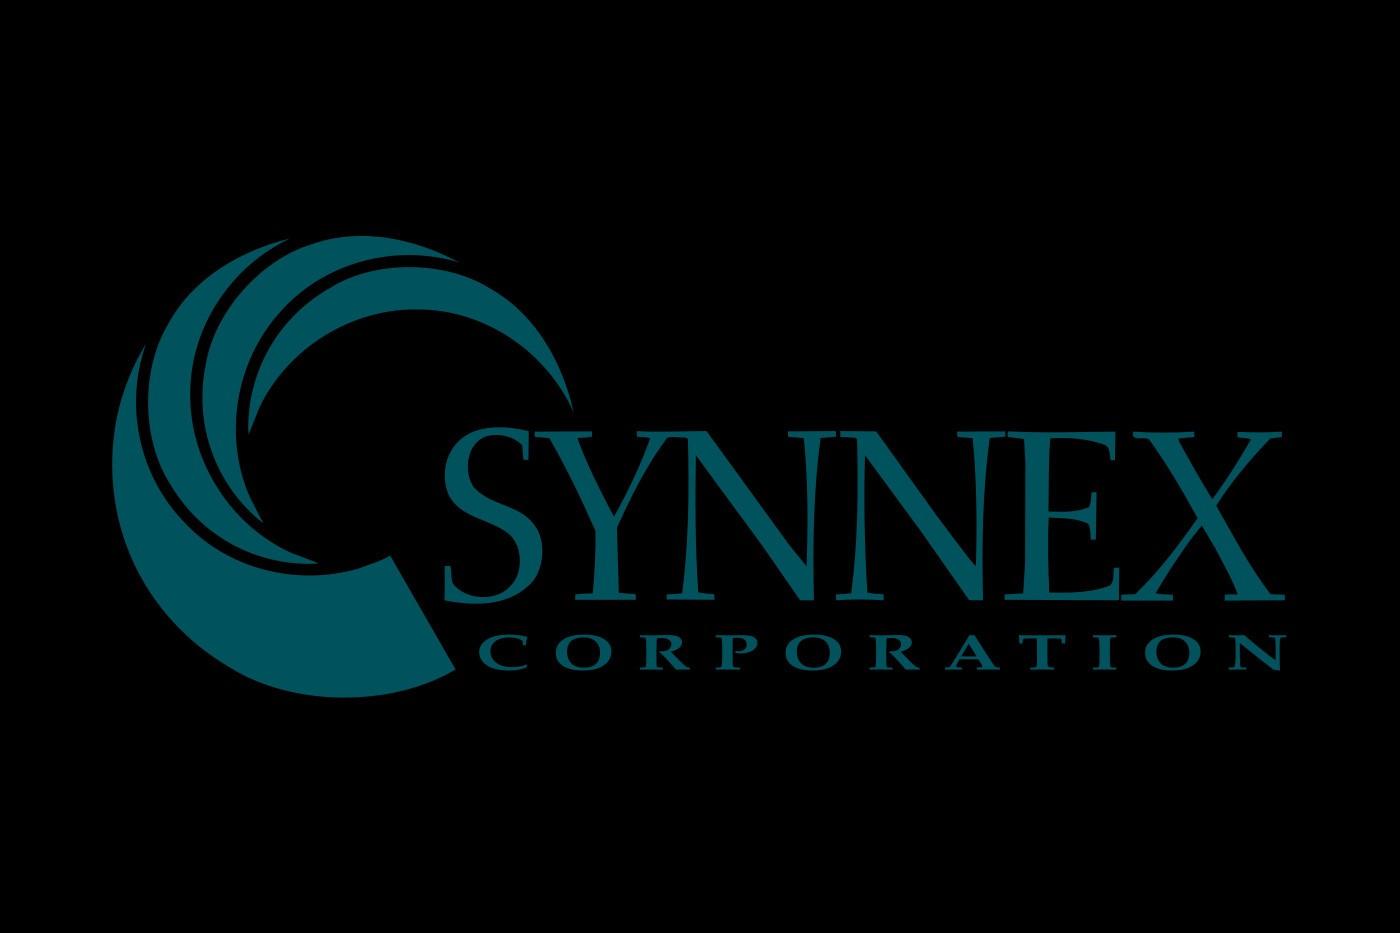 SYNNEX CORPORATION — НОВЫЙ ДИСТРИБЬЮТОР BLACKBERRY